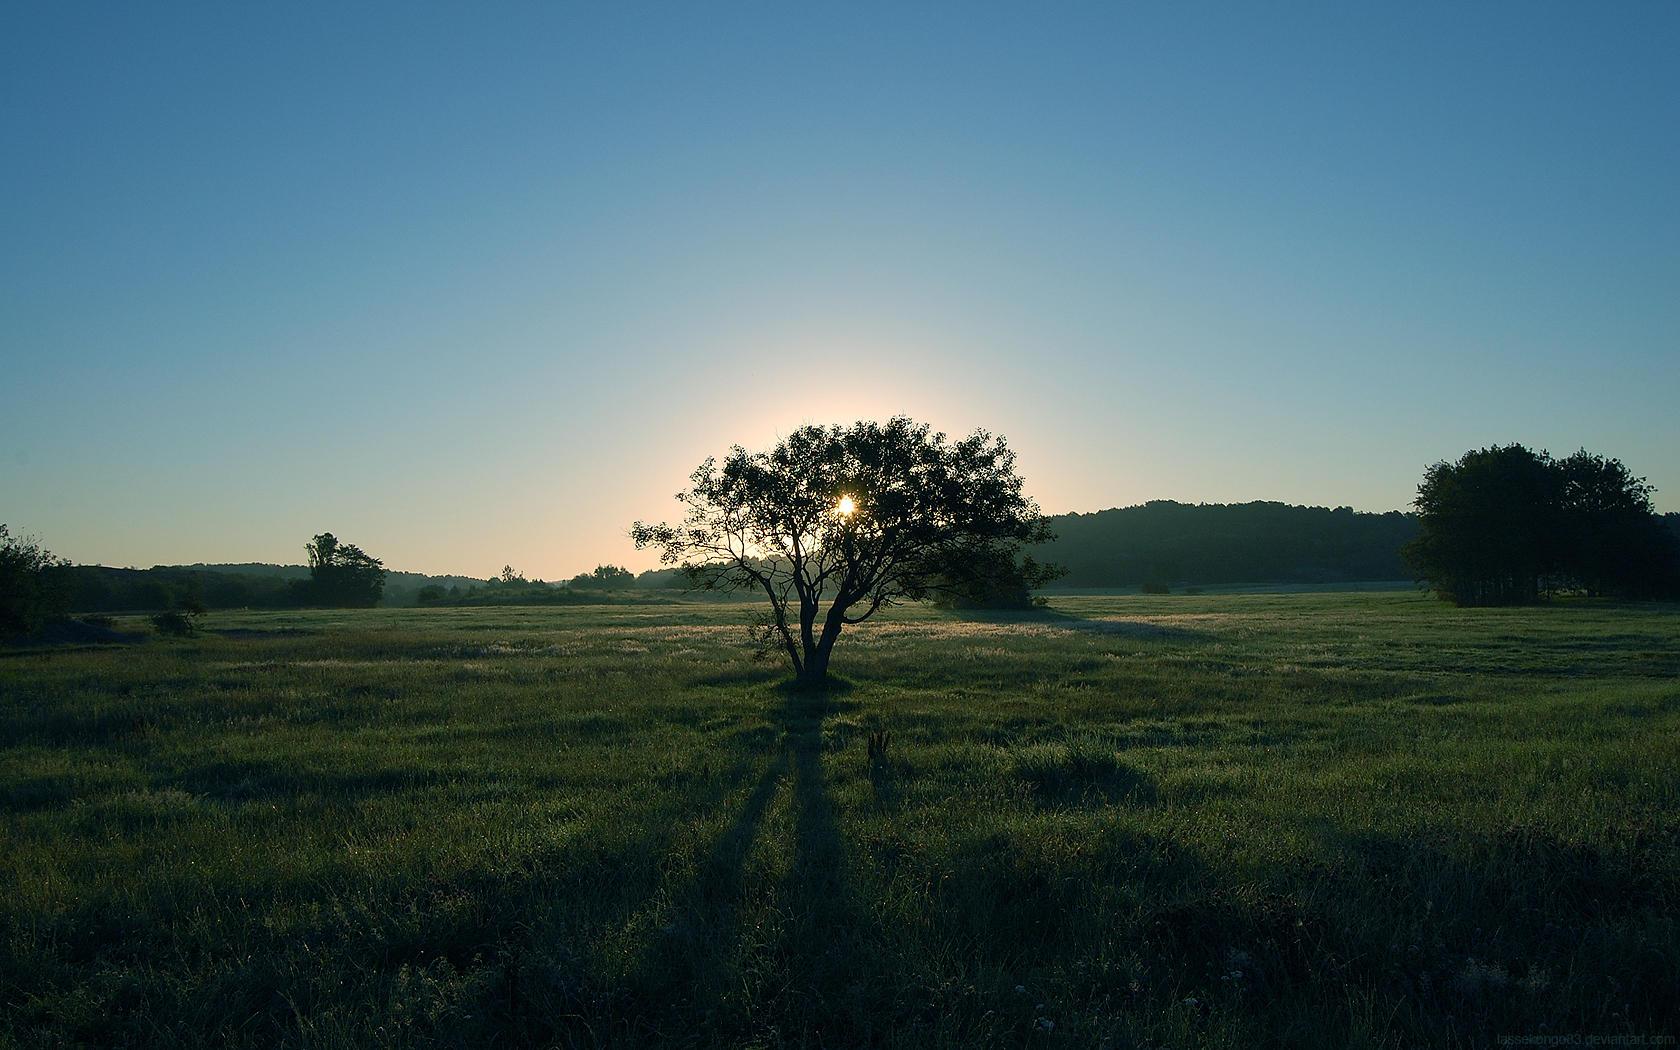 Dawn by lassekongo83